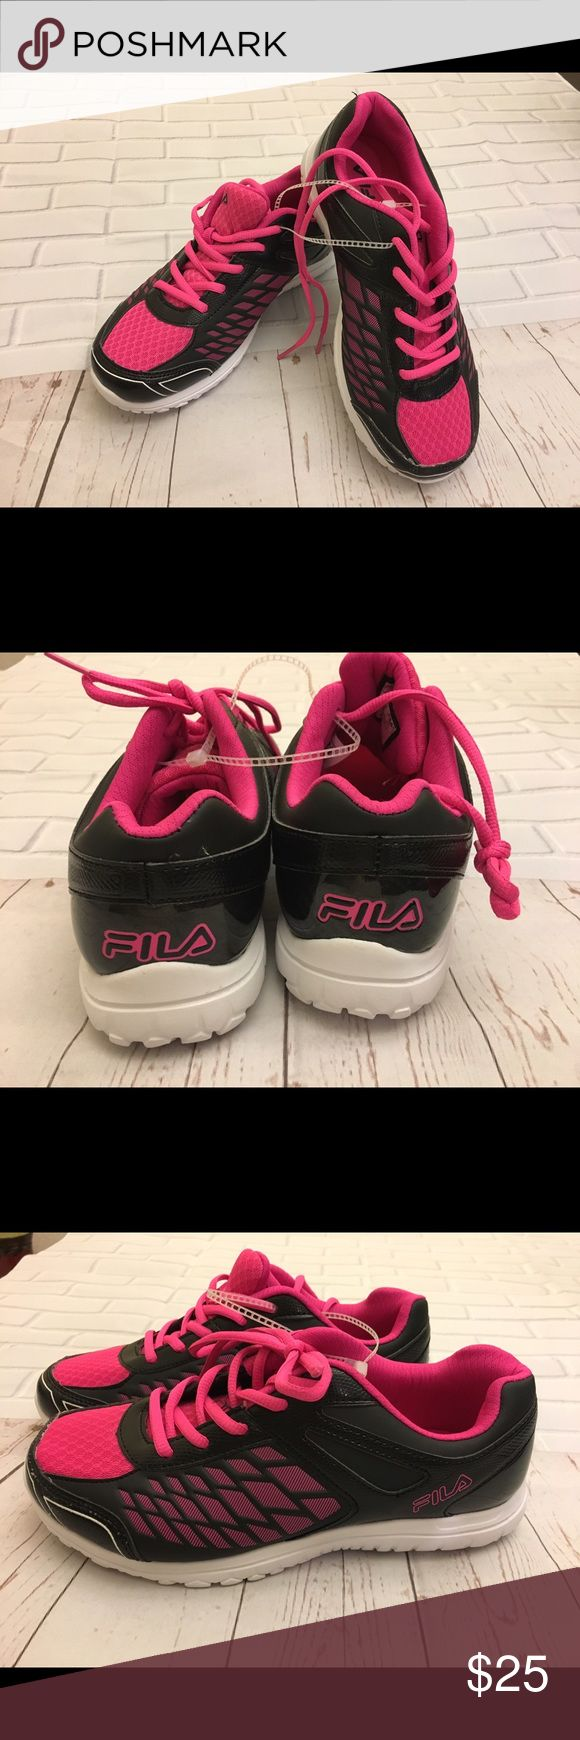 ✨Fila Sneakers size 6 1/2 brand new✨ Brand new black/pink Fila sneakers size 6.5. Very comfy & stylish. Fila Shoes Sneakers